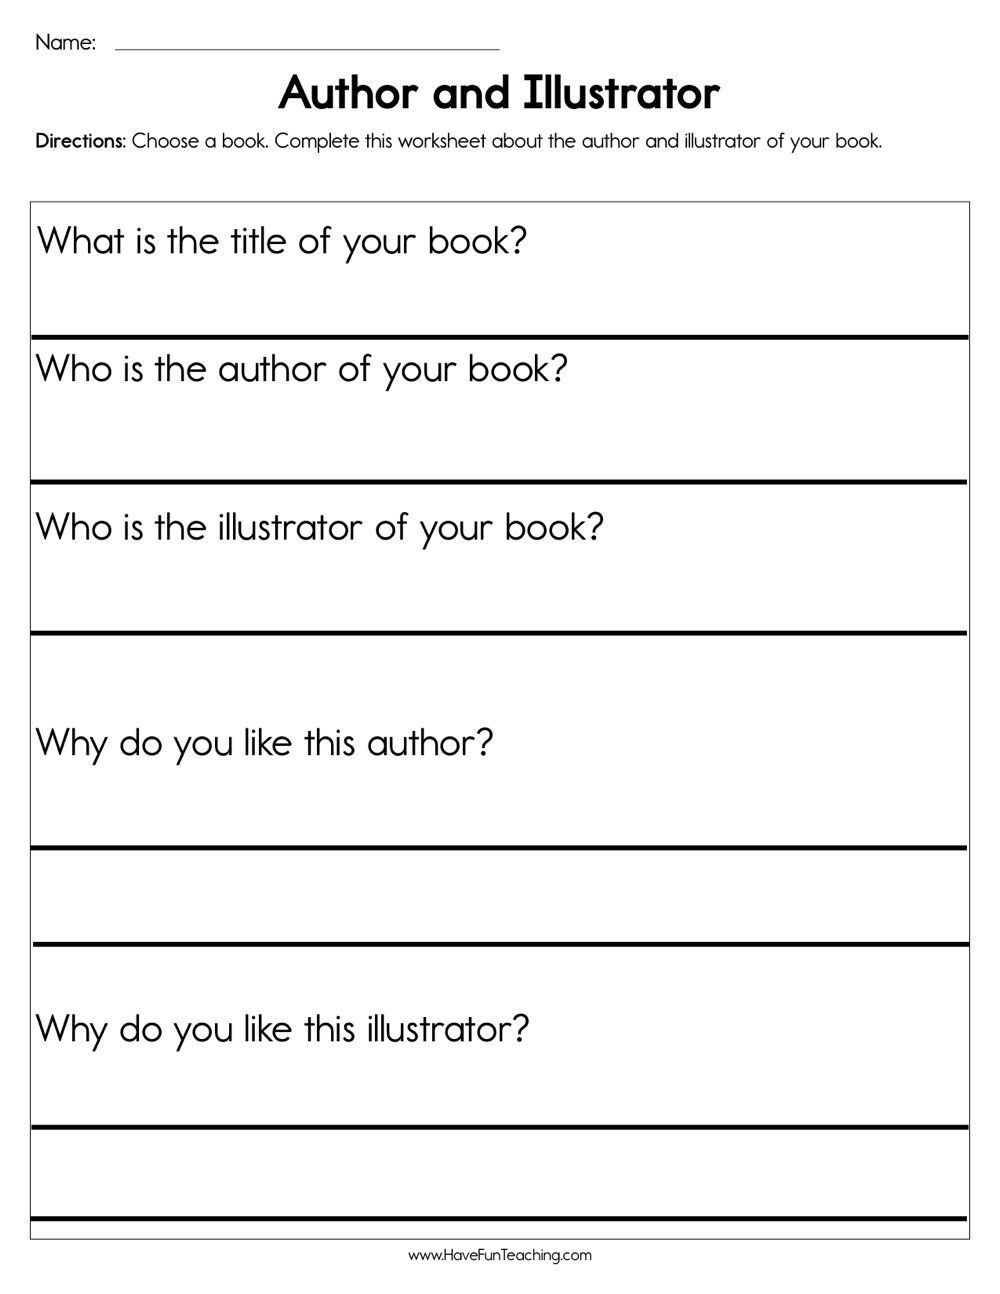 Author and Illustrator Worksheet   Have fun teaching [ 1294 x 1000 Pixel ]